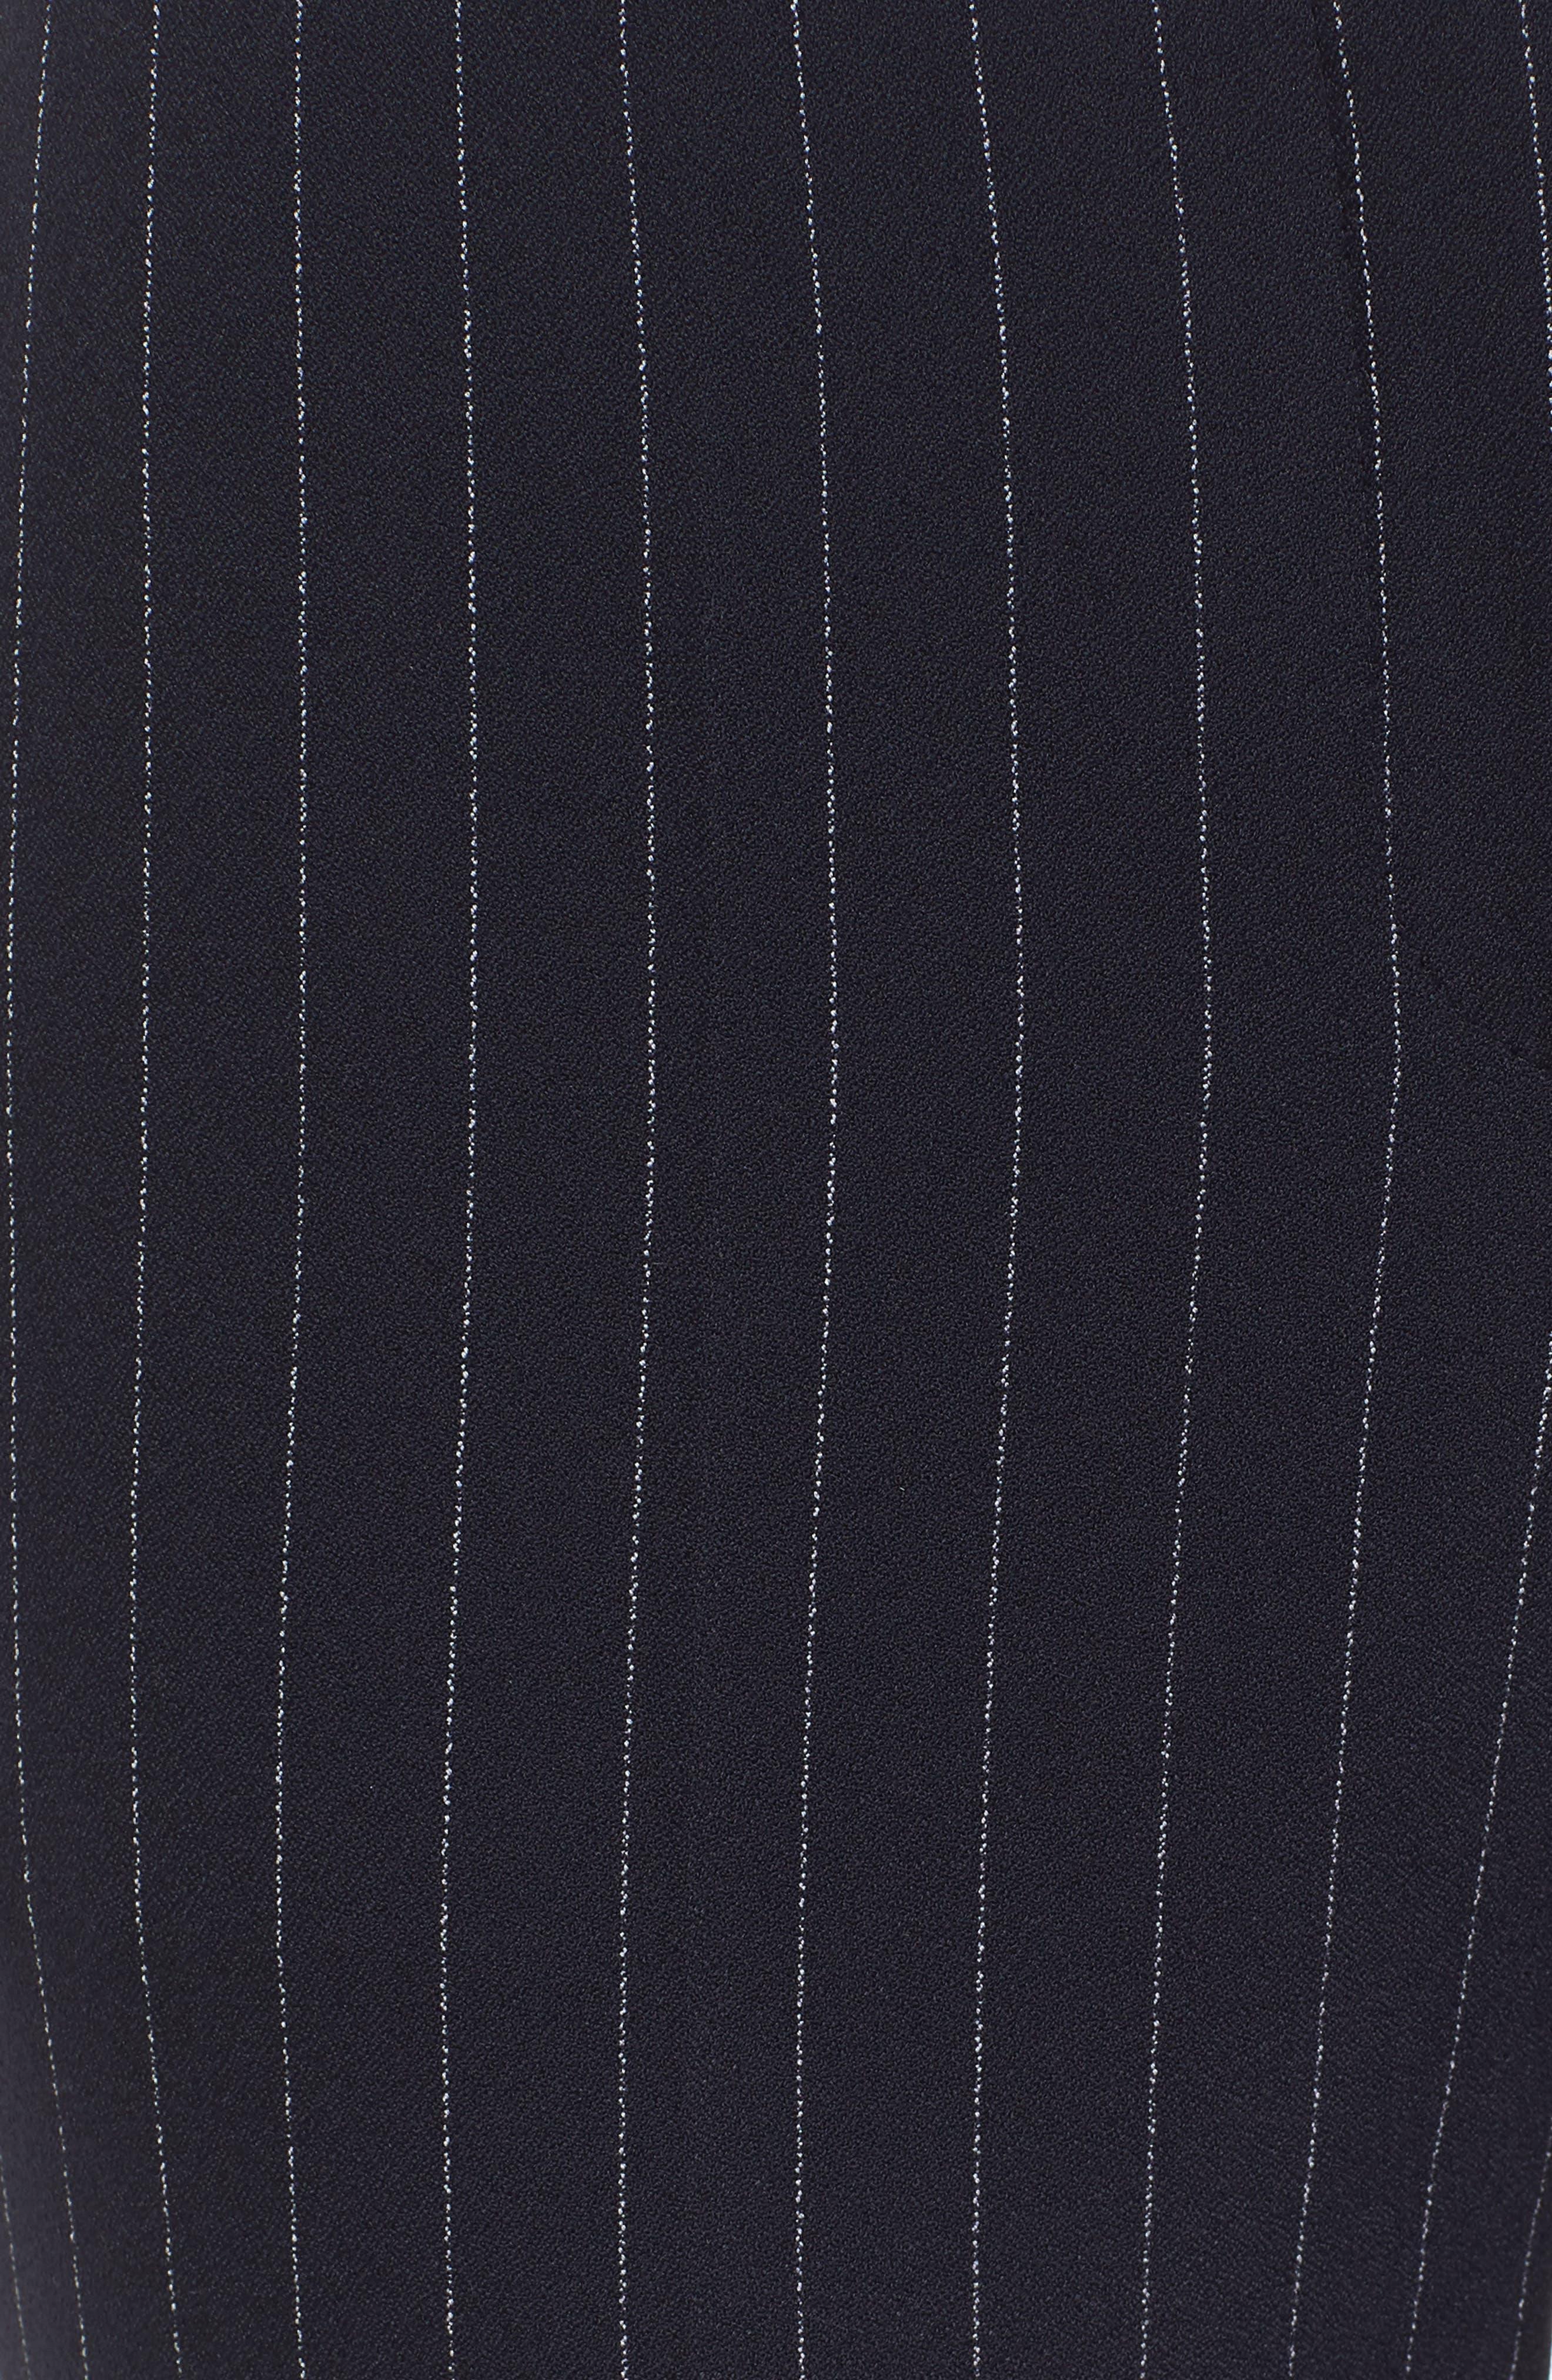 Titana Pinstripe Suit Trousers,                             Alternate thumbnail 6, color,                             461